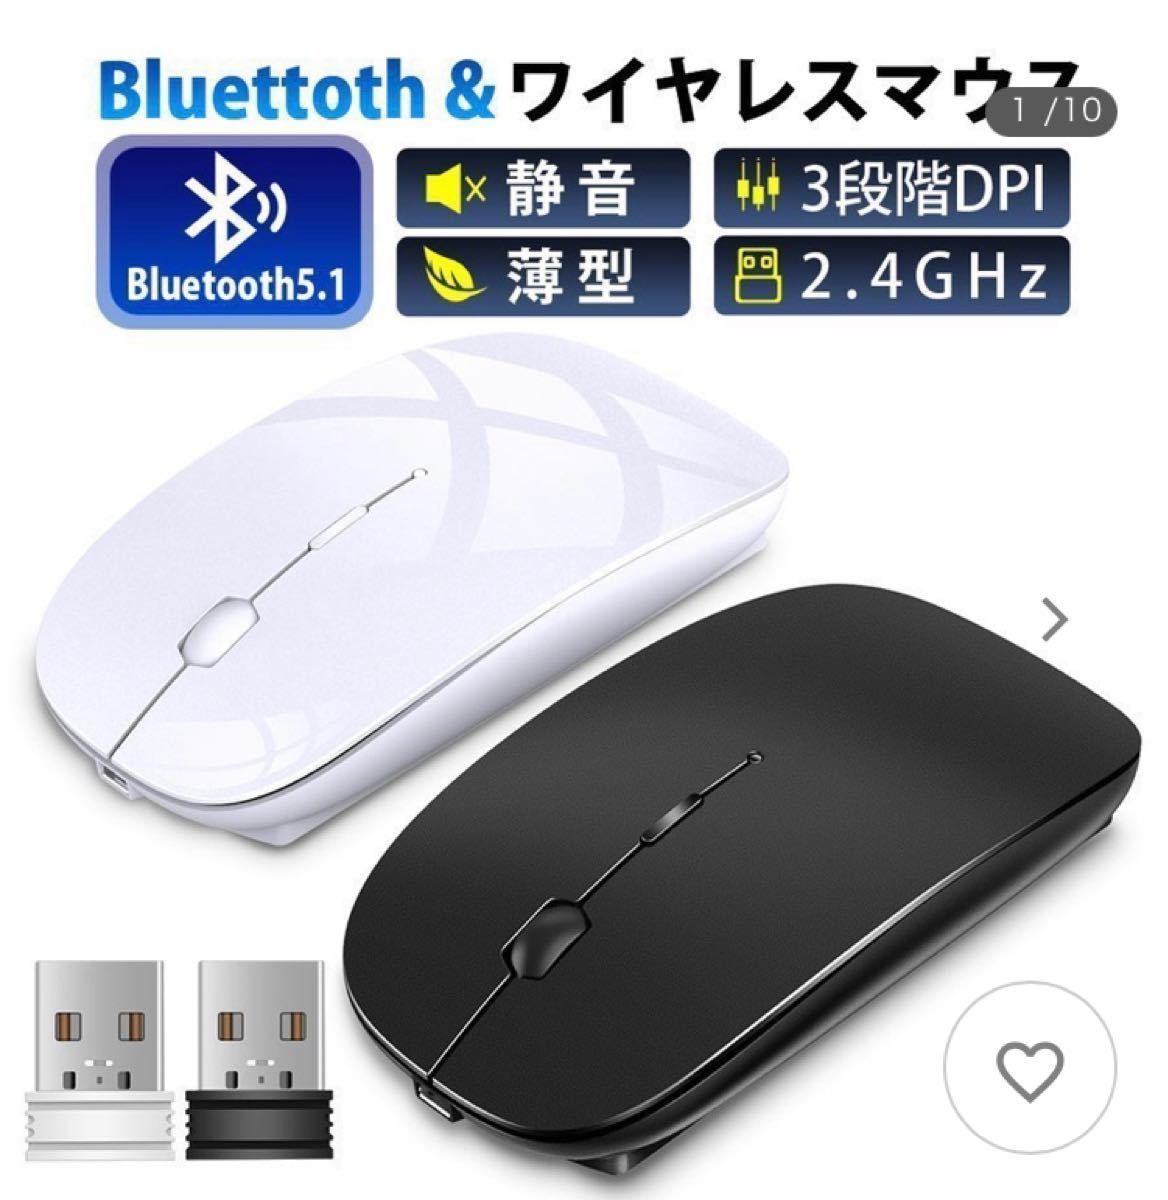 Blue tooth ワイヤレスマウス